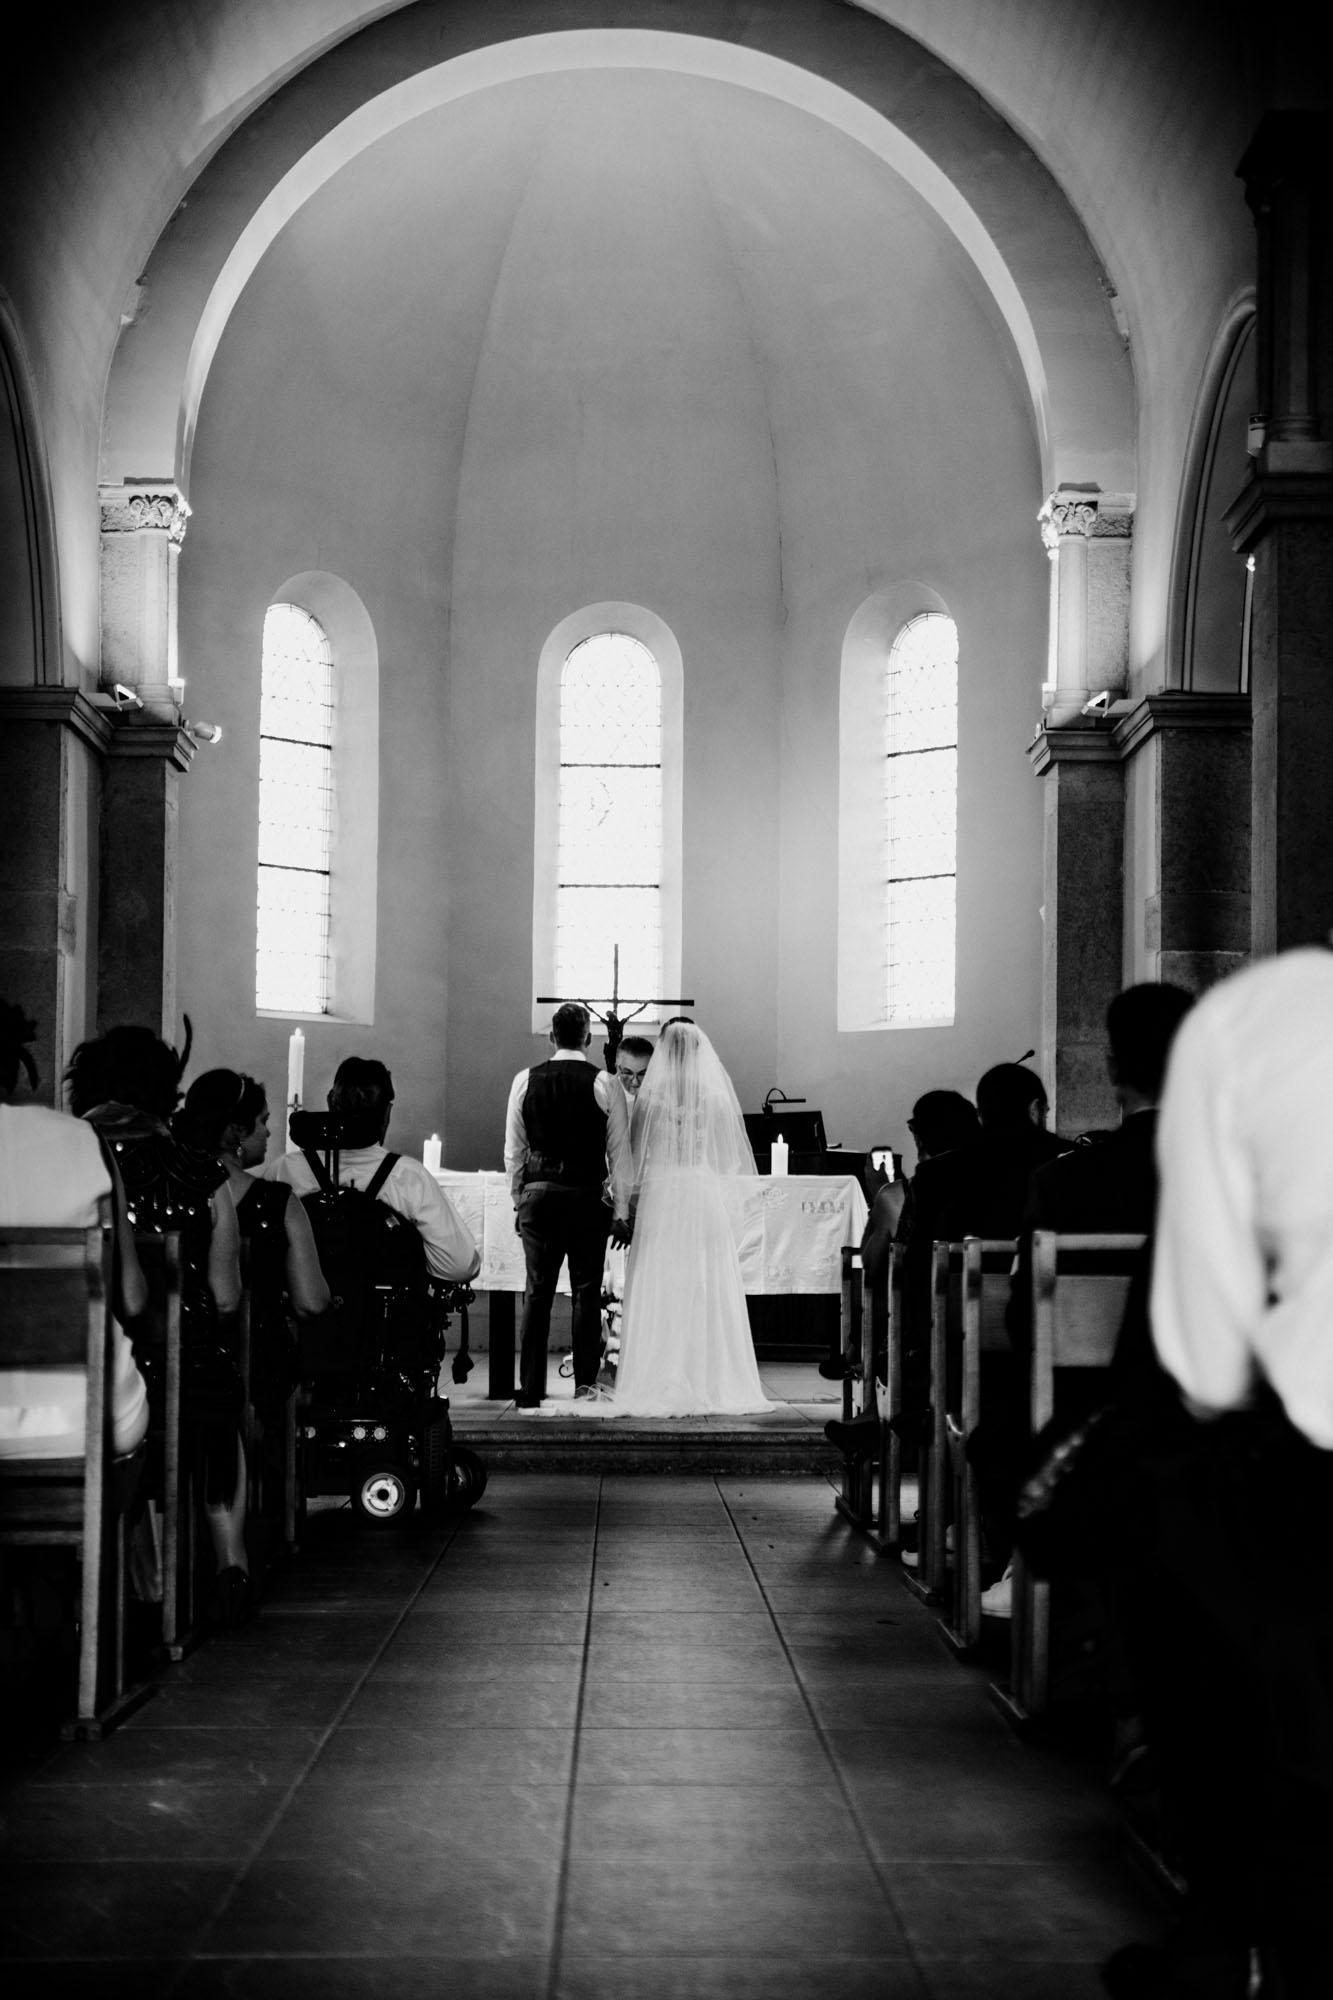 2018-09-29 - LD8_0912 - photographe mariage lyon - laurie diaz - www.lauriediazweeding.com.jpg